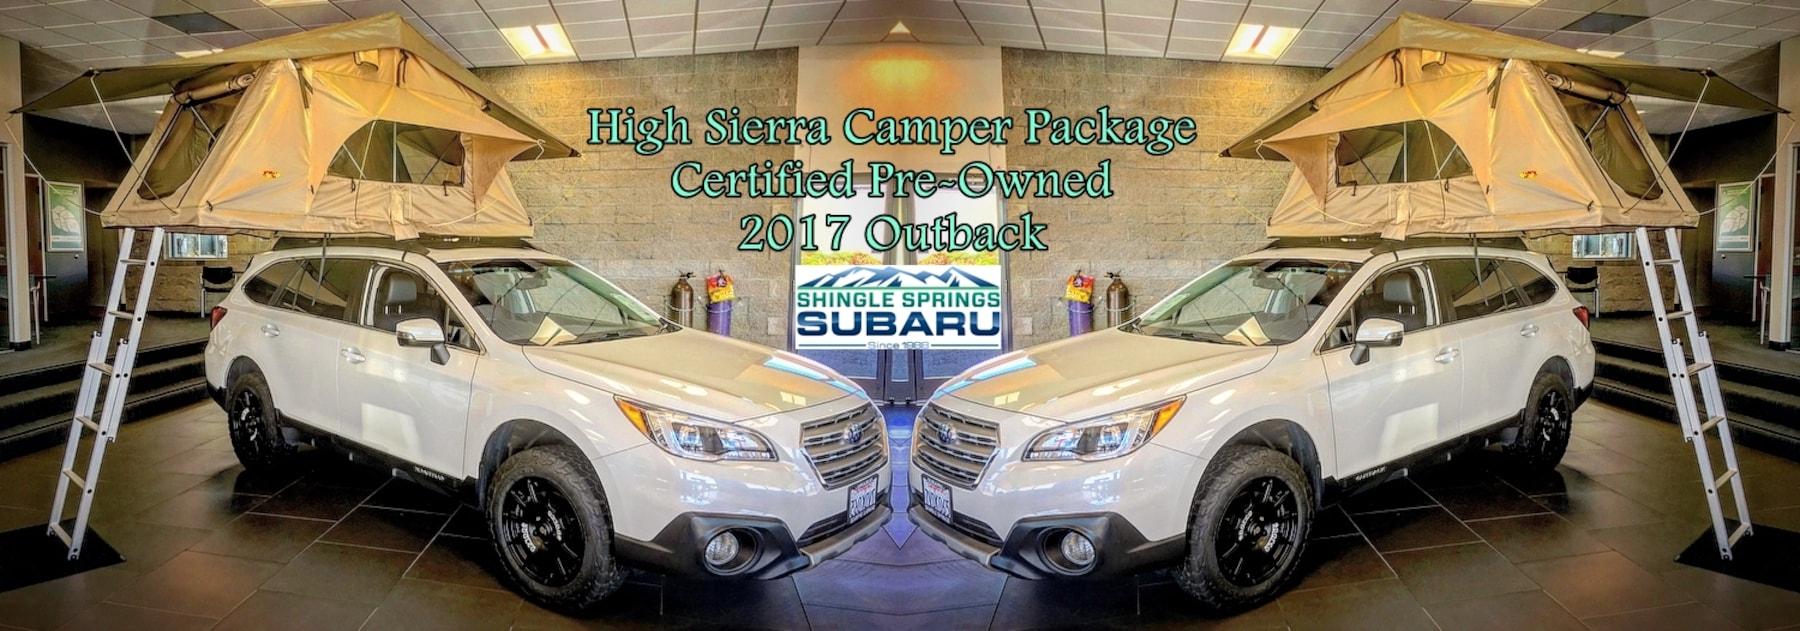 Shingle Springs Subaru In Shingle Springs Ca